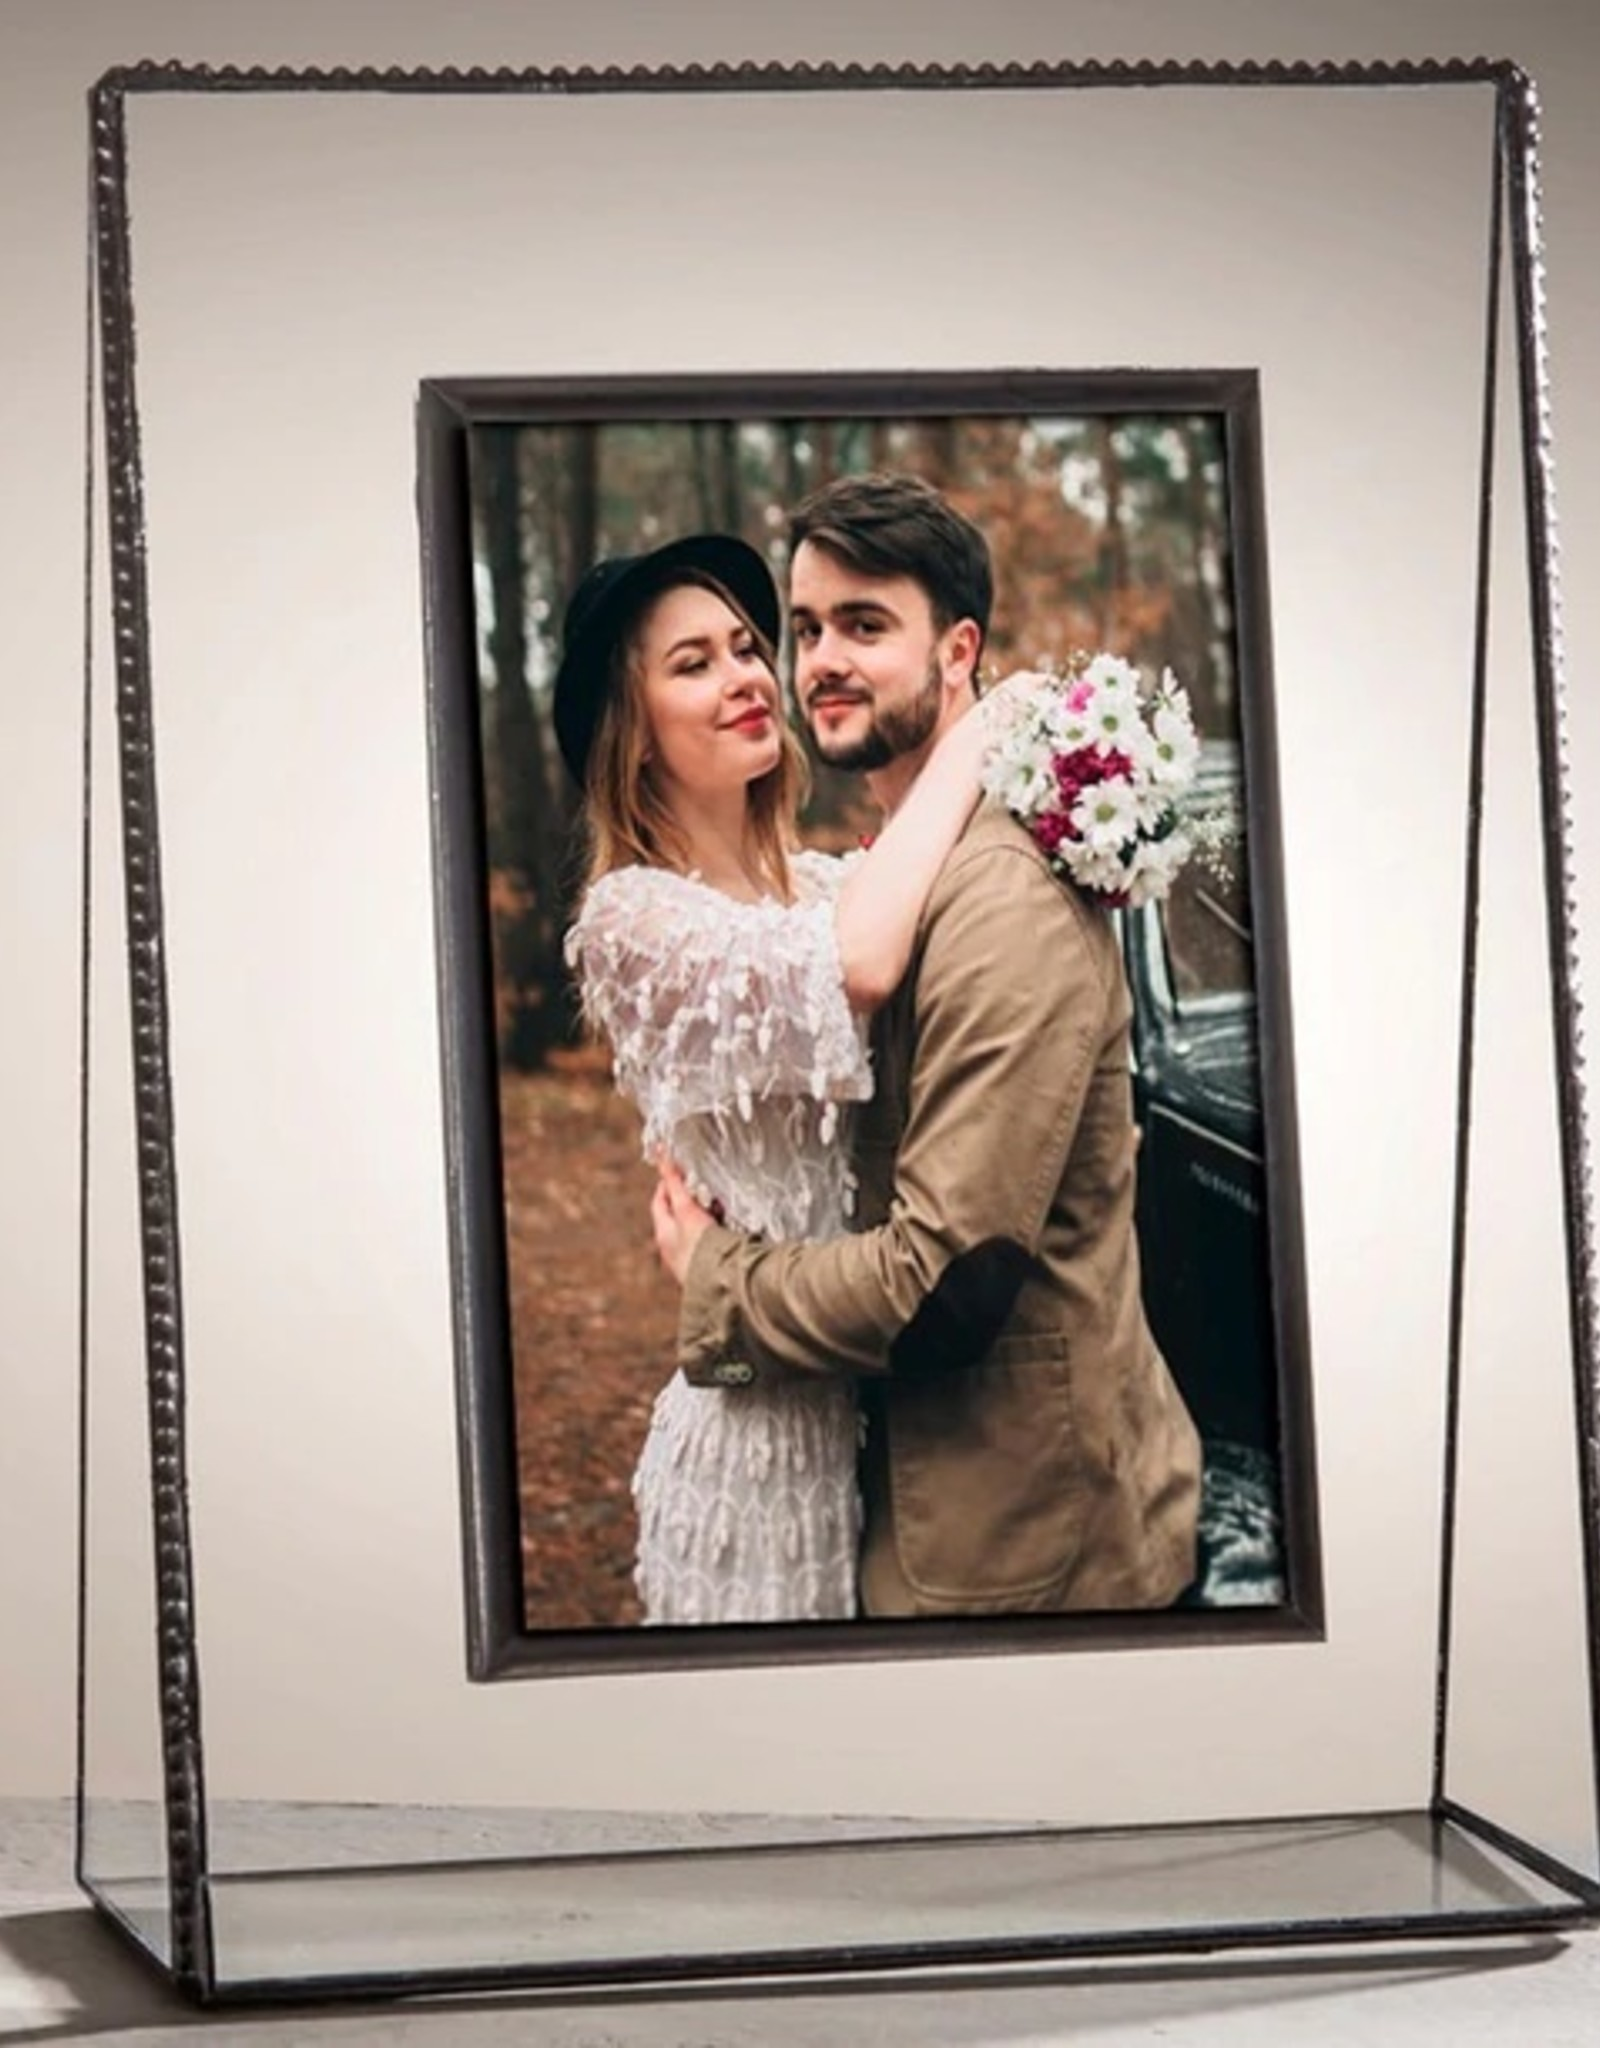 J Devlin Glass Photo Frame